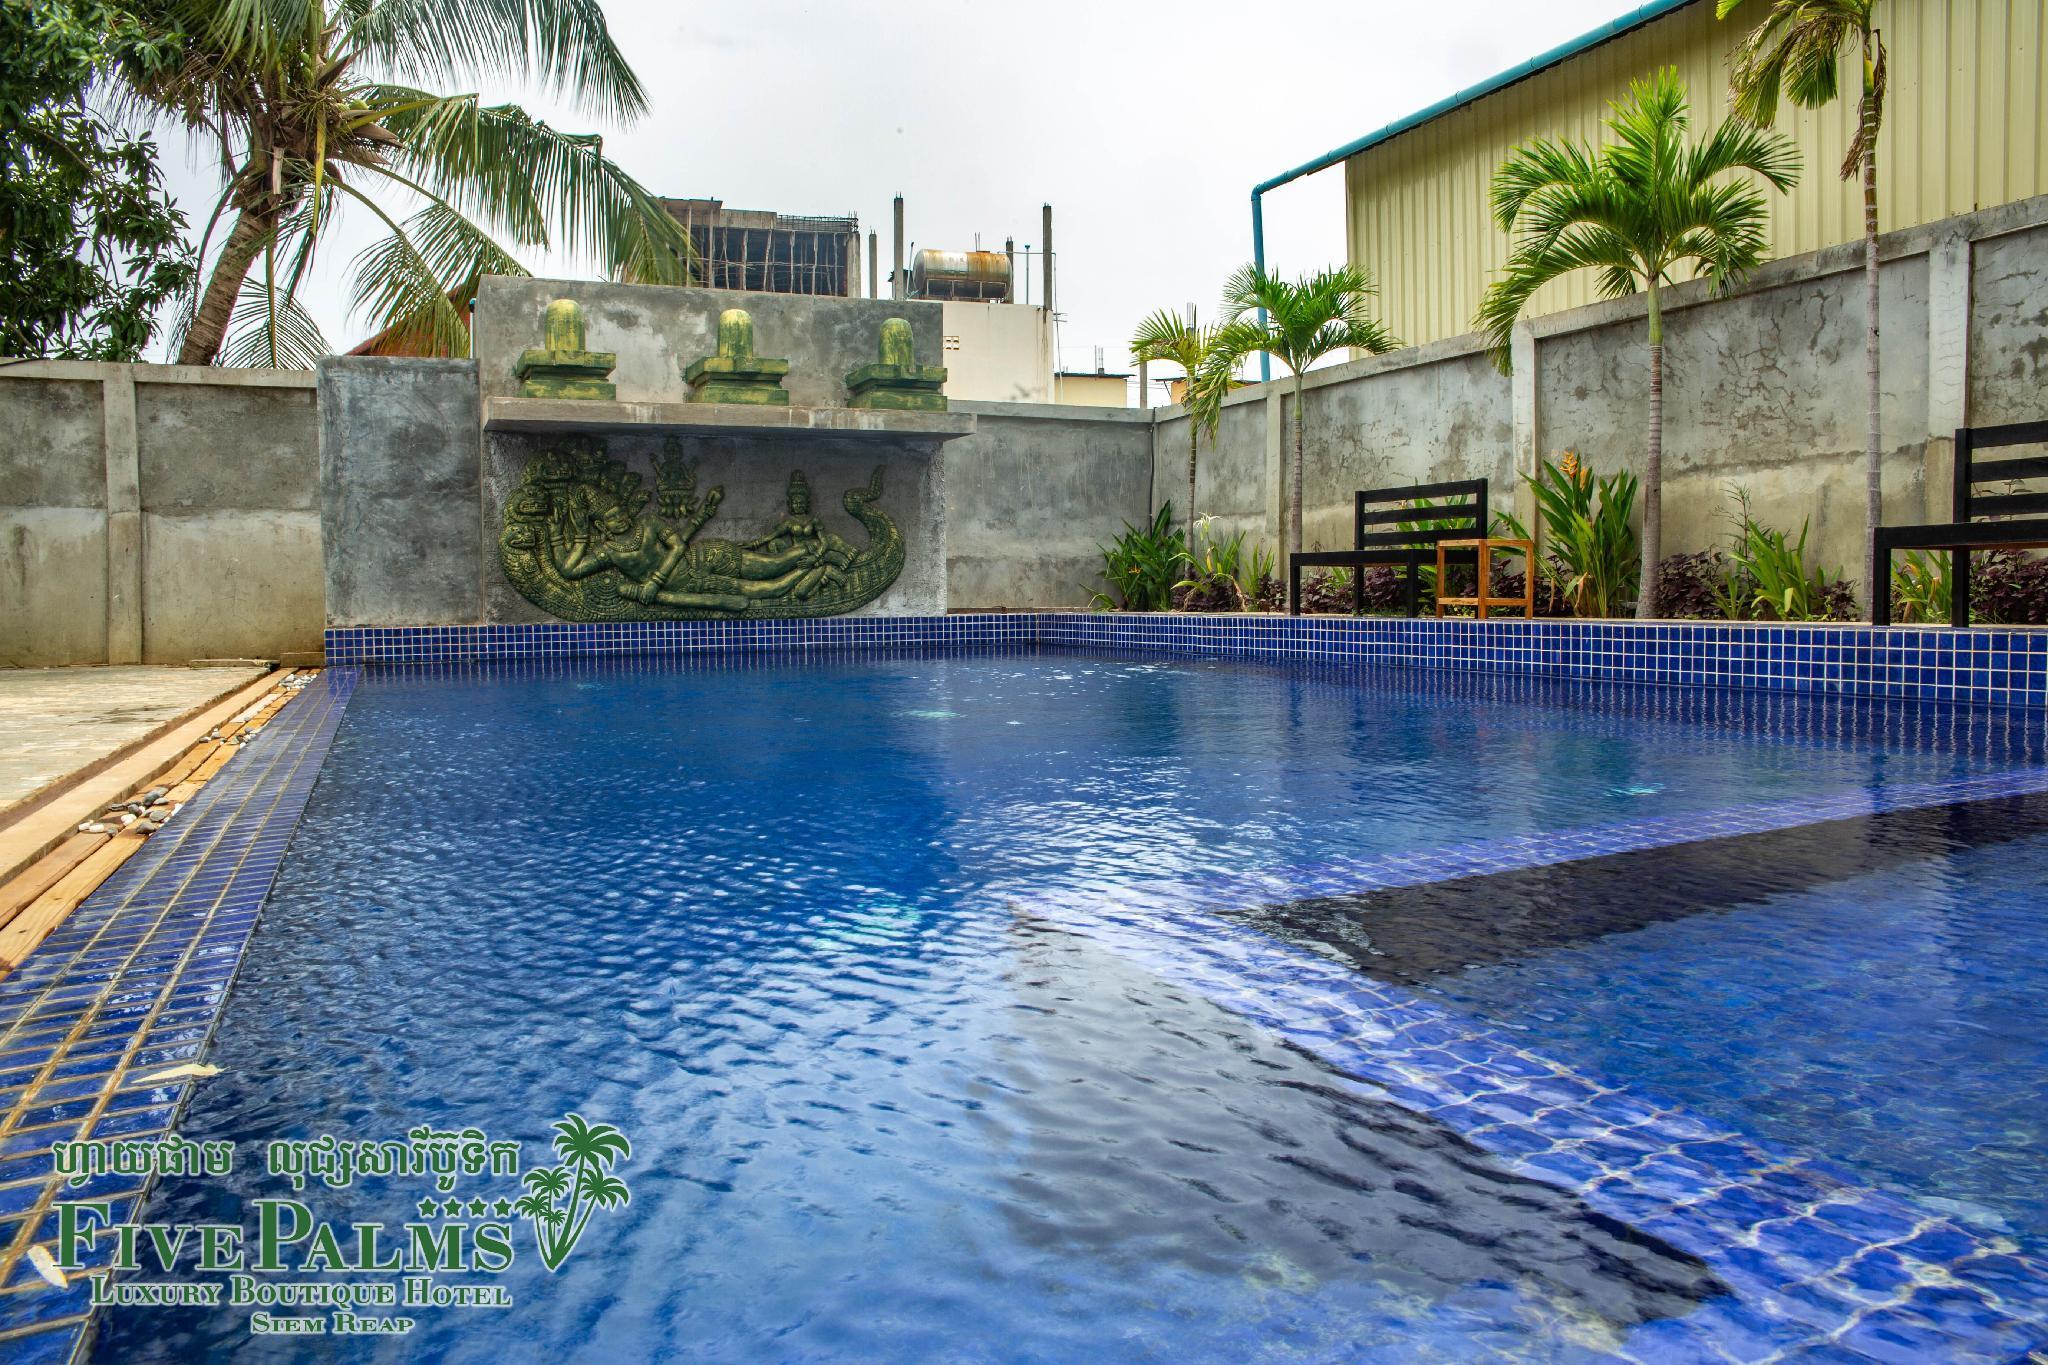 Five Palms Luxury Boutique Hotel